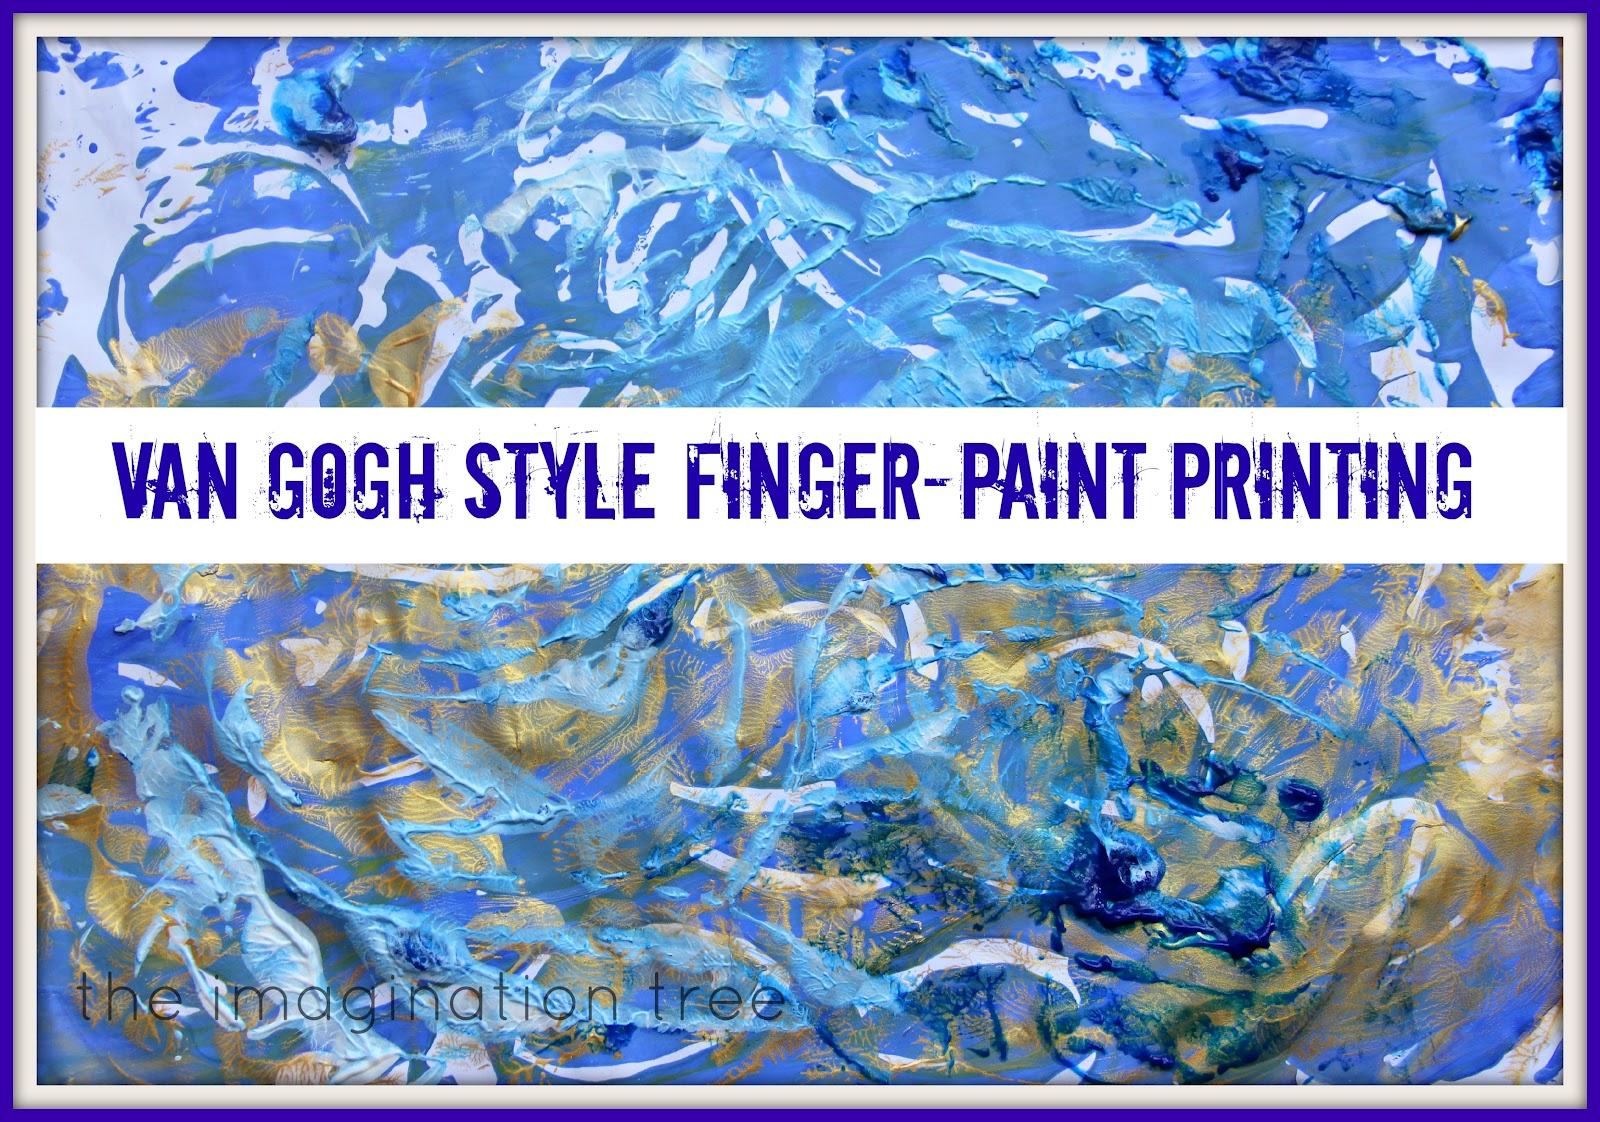 Van Gogh Style Finger Paint Printing